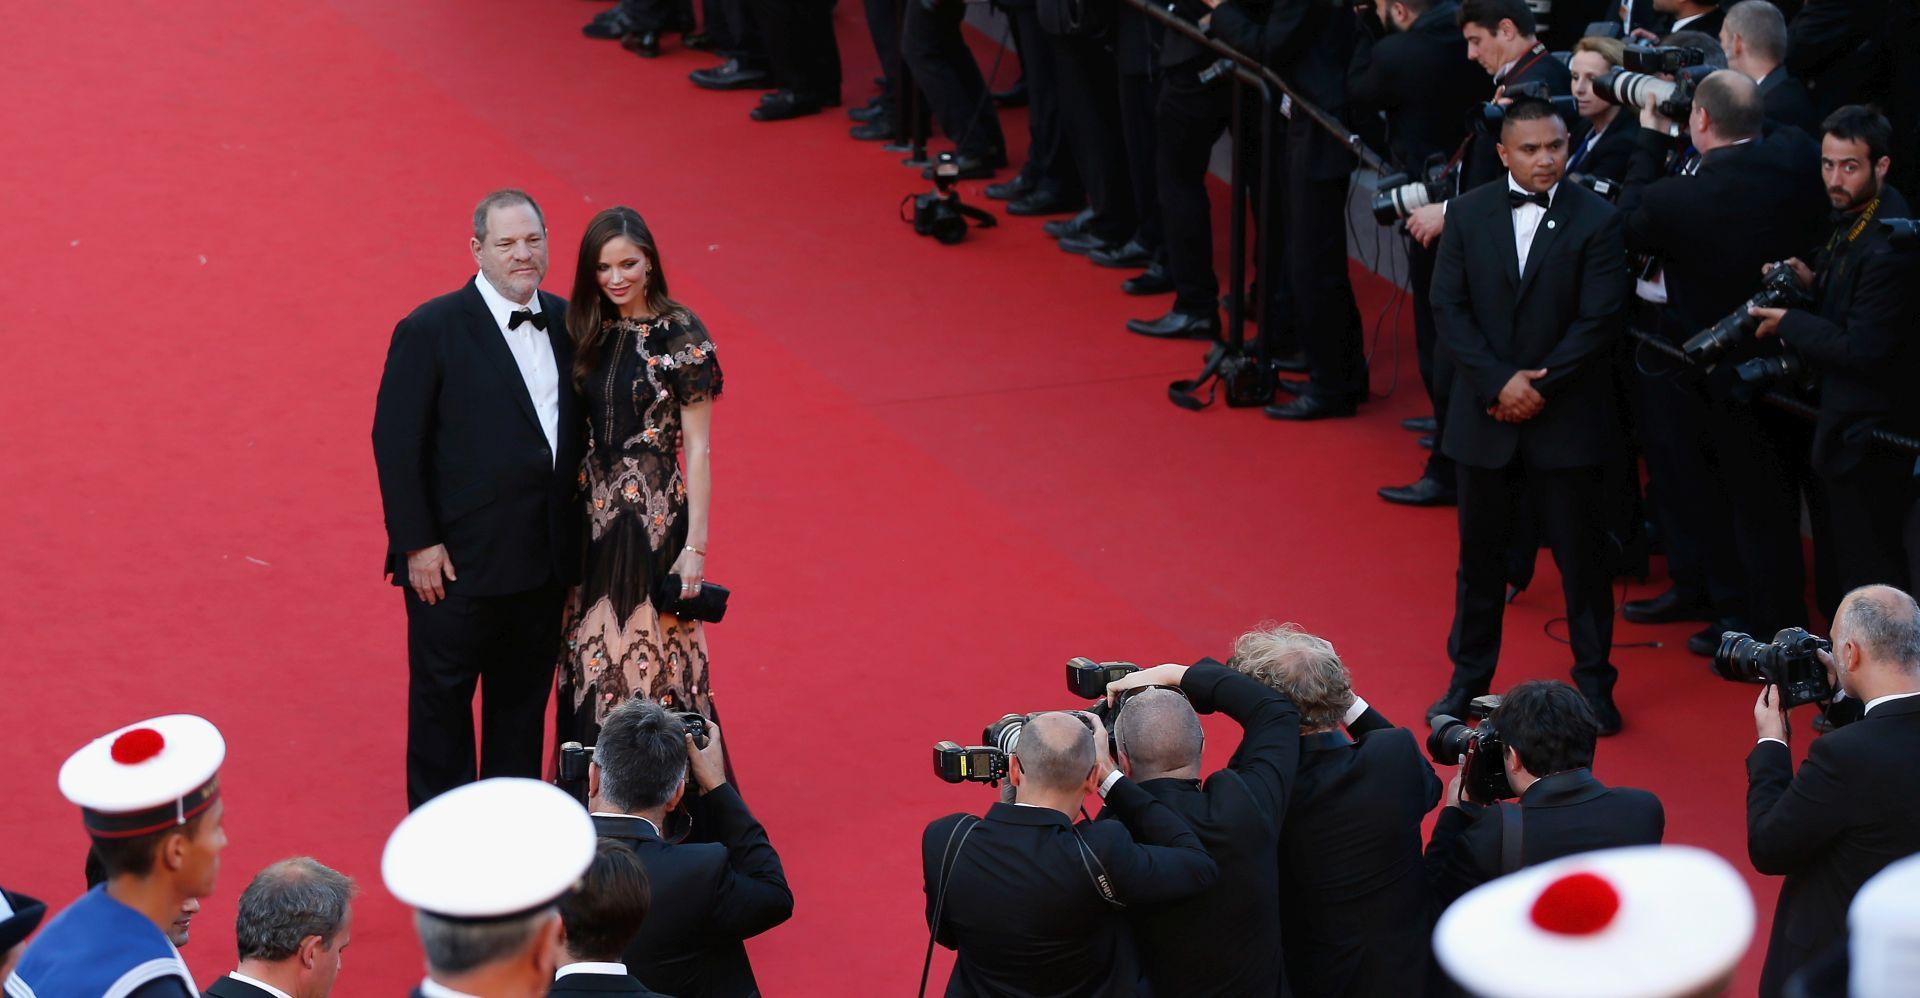 Počela istraga protiv hollywoodskog moćnika Harveyja Weinsteina